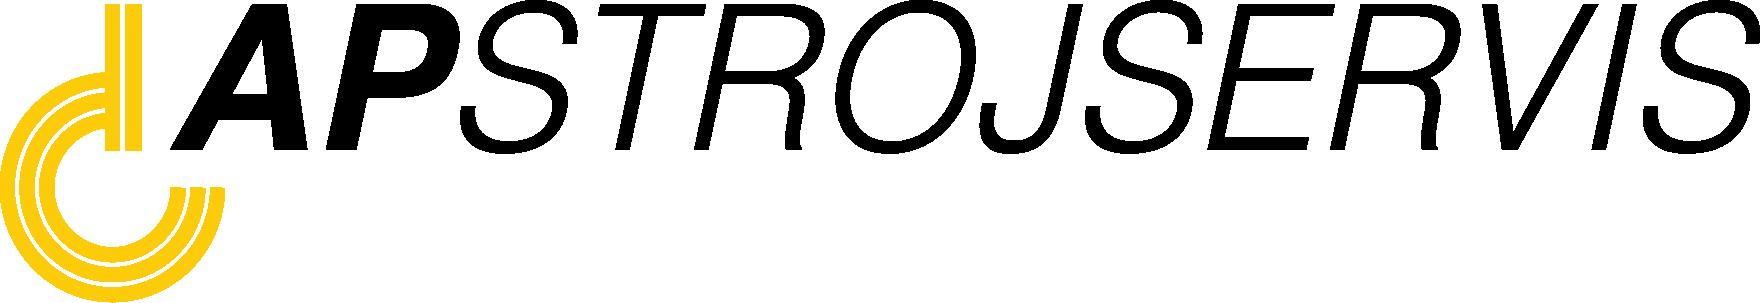 AP-STROJSERVIS s.r.o.